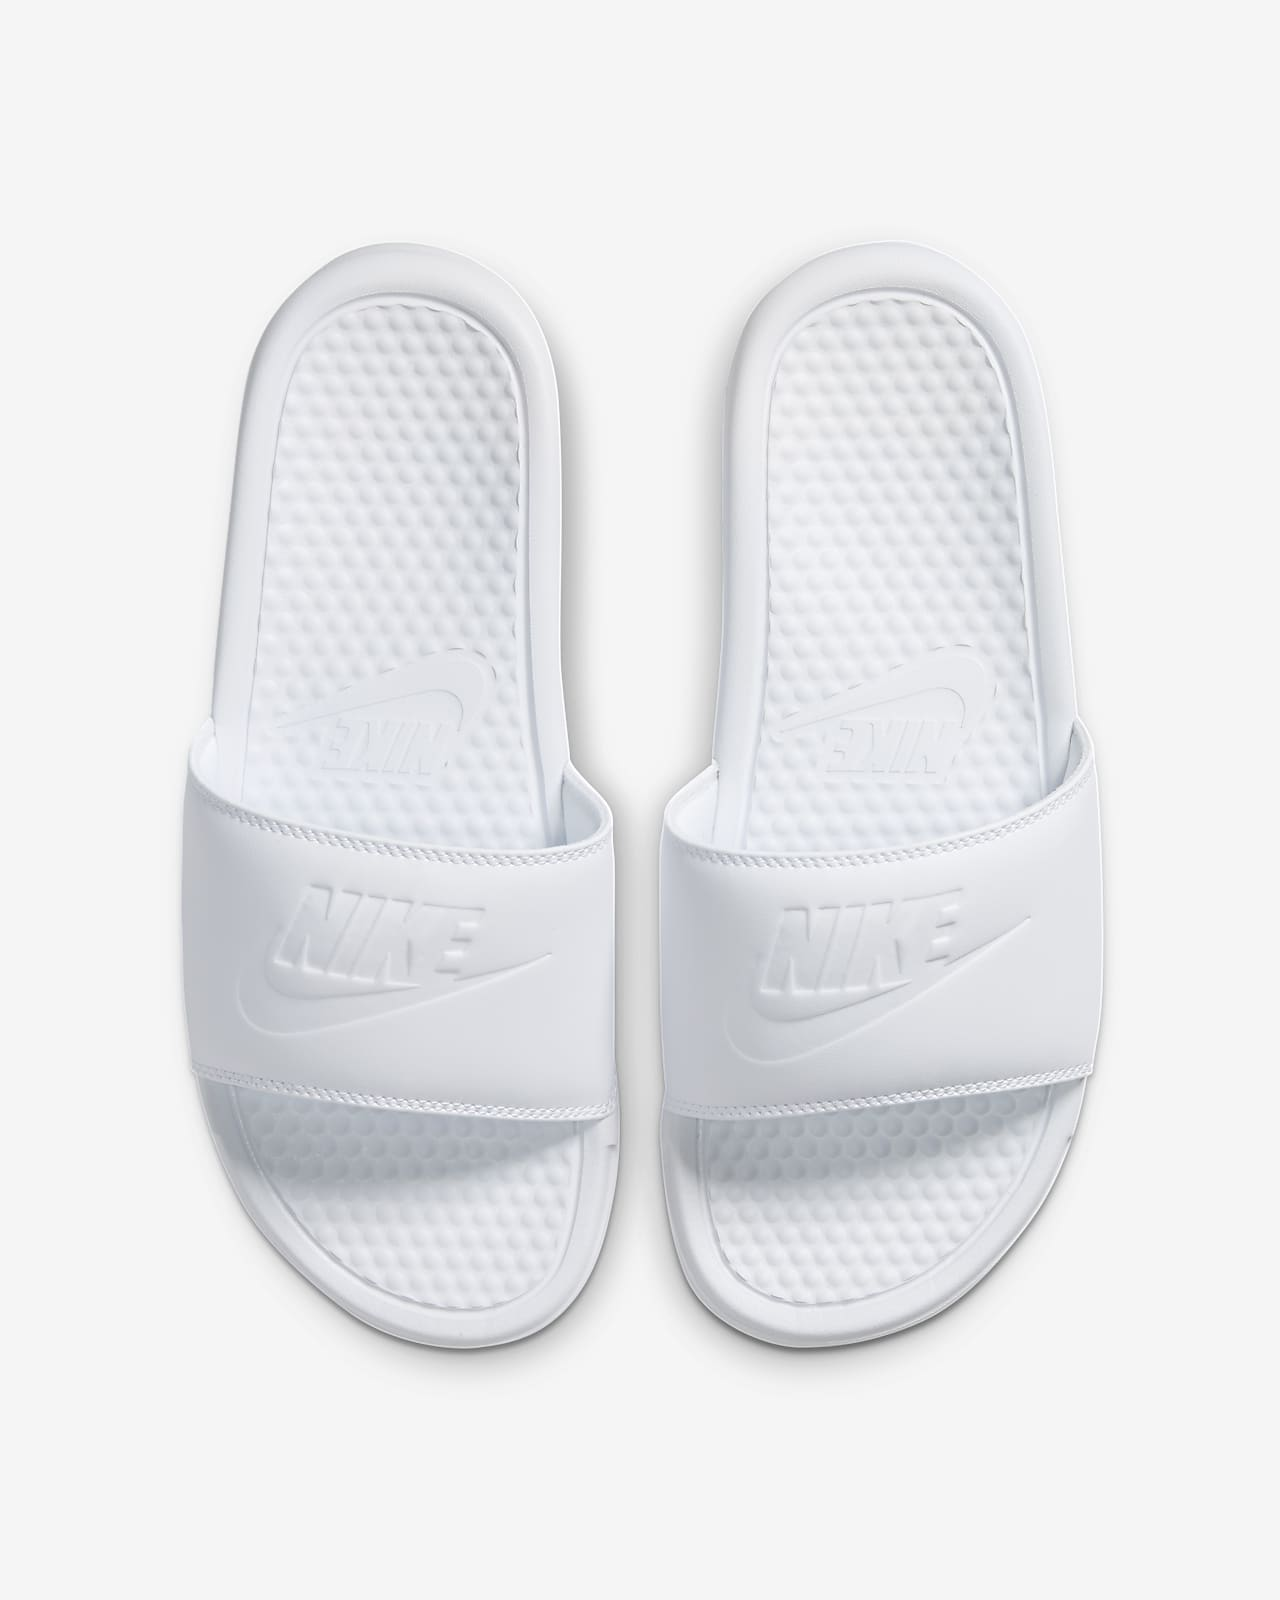 Perfecto esfera tenga en cuenta  Nike Benassi JDI Women's Slide. Nike.com